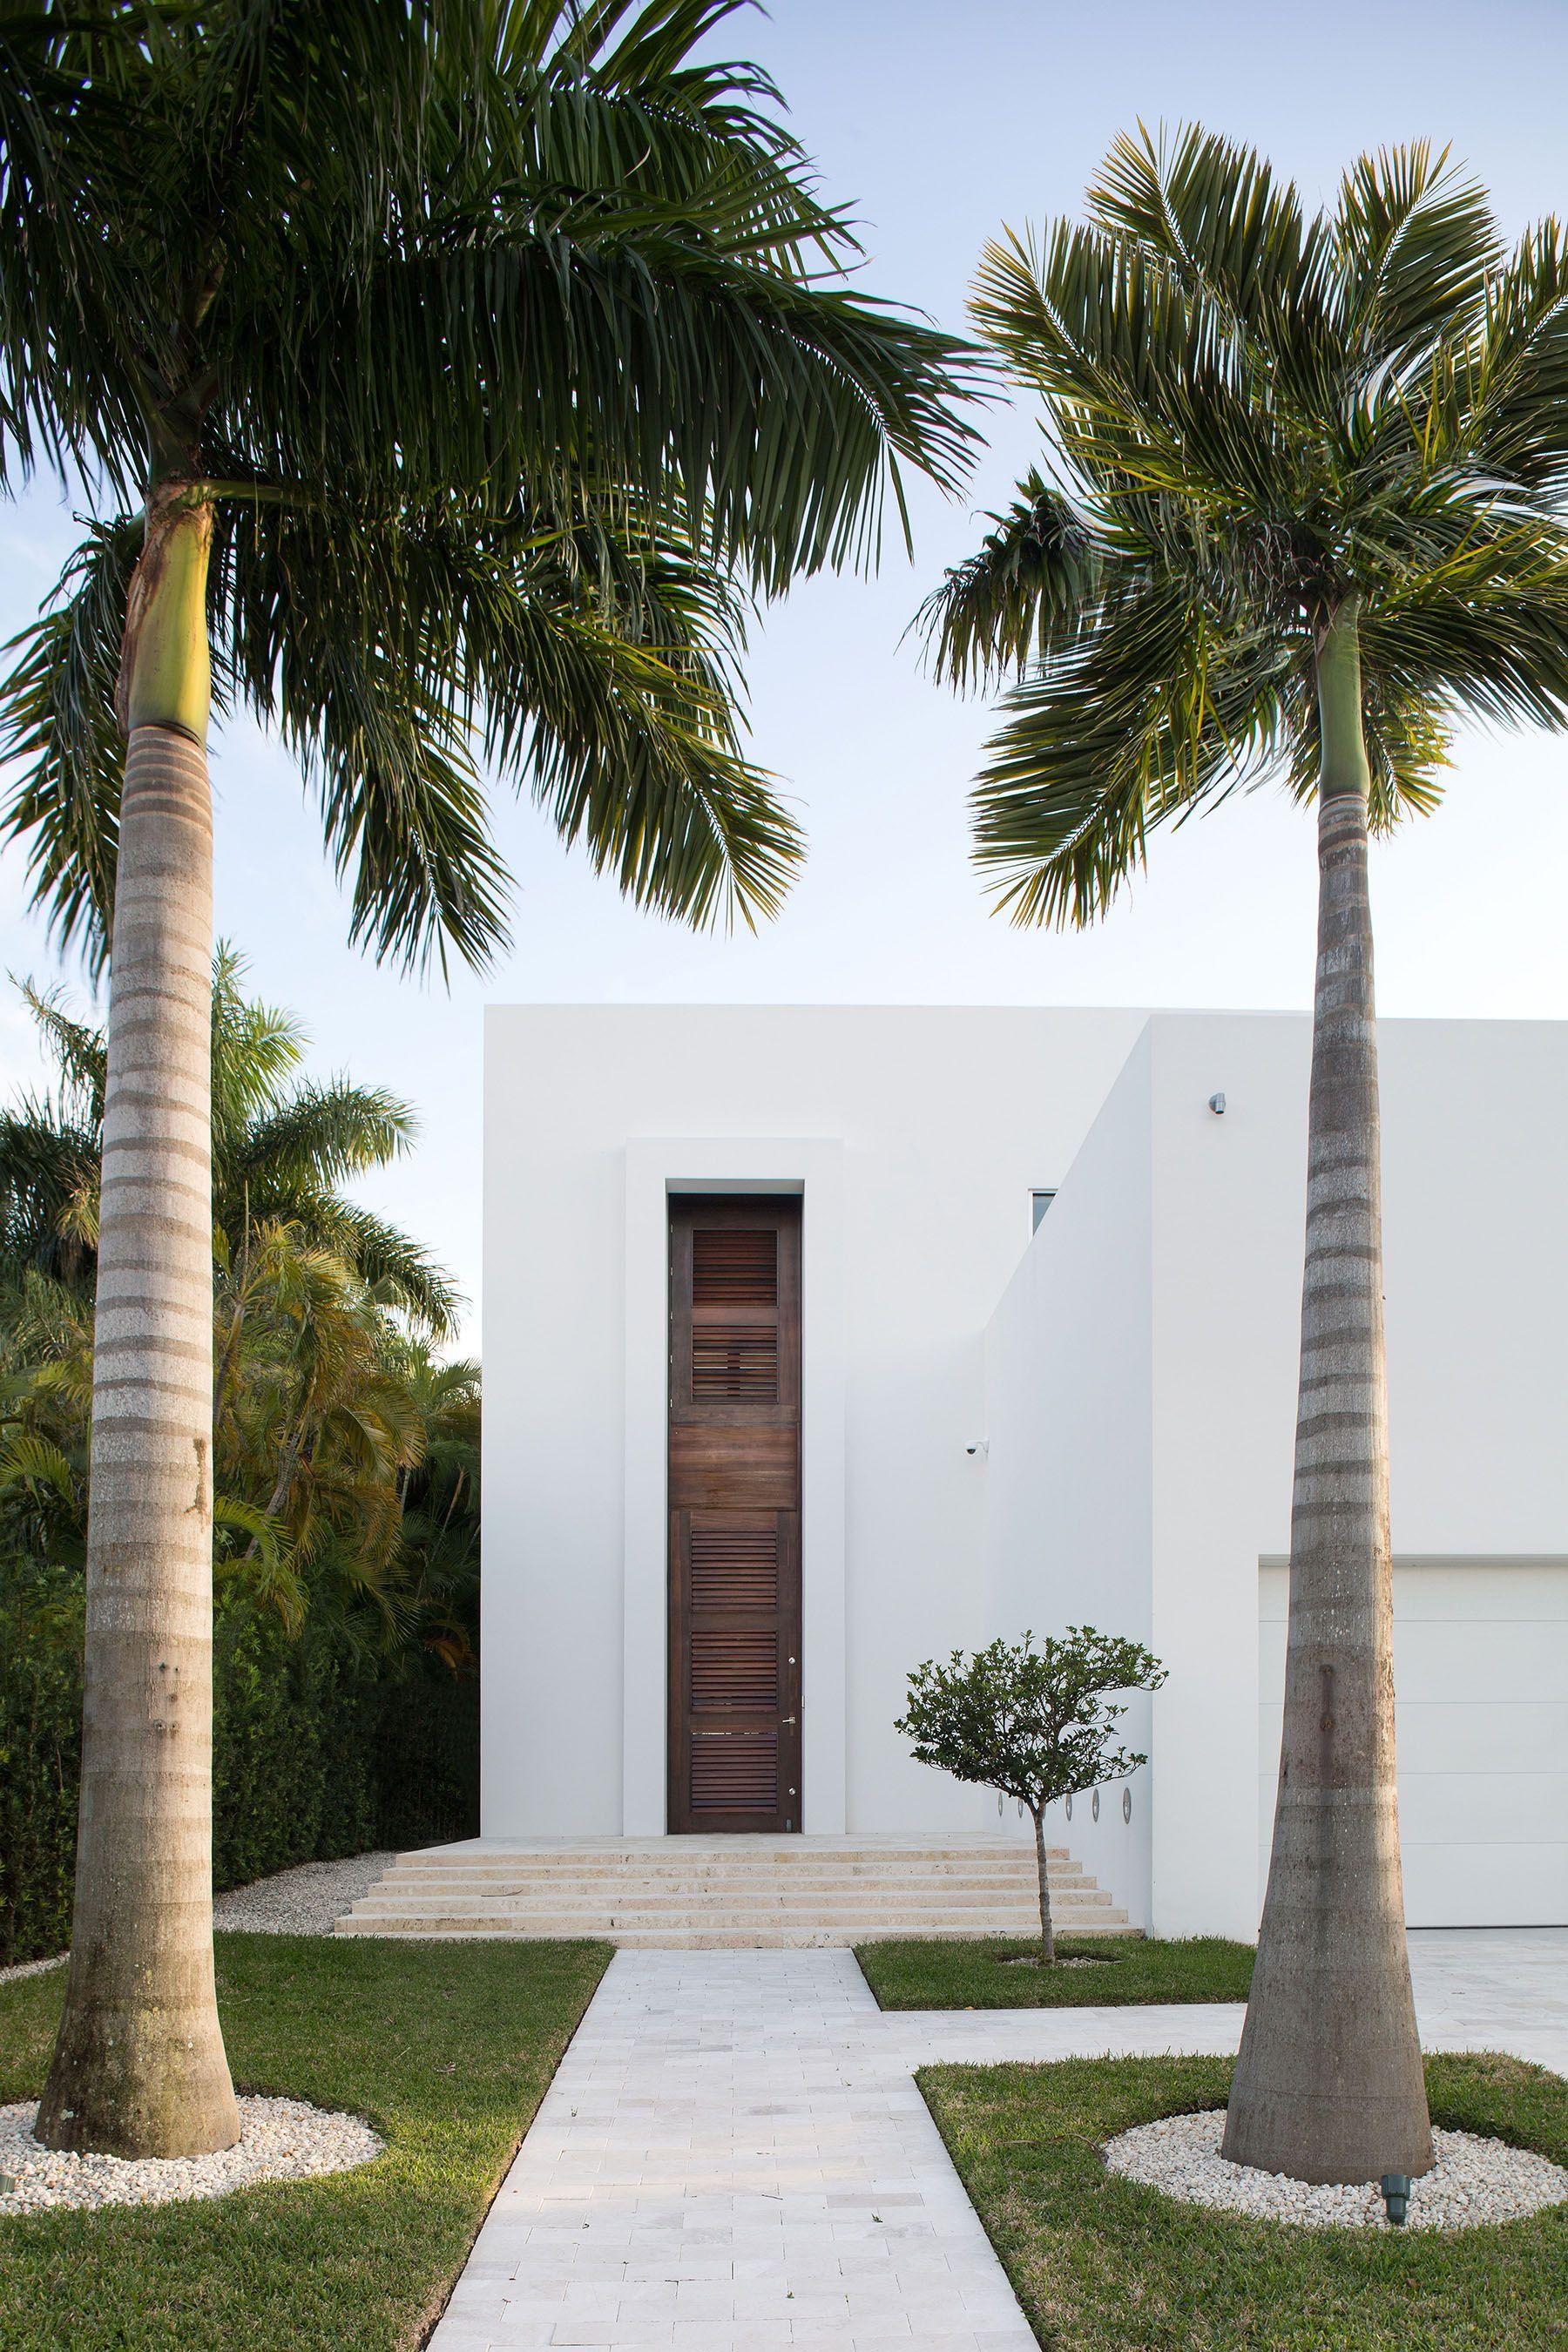 Strang Architecture Fachada De Casa Fachadas Casas Minimalistas Arquitectura